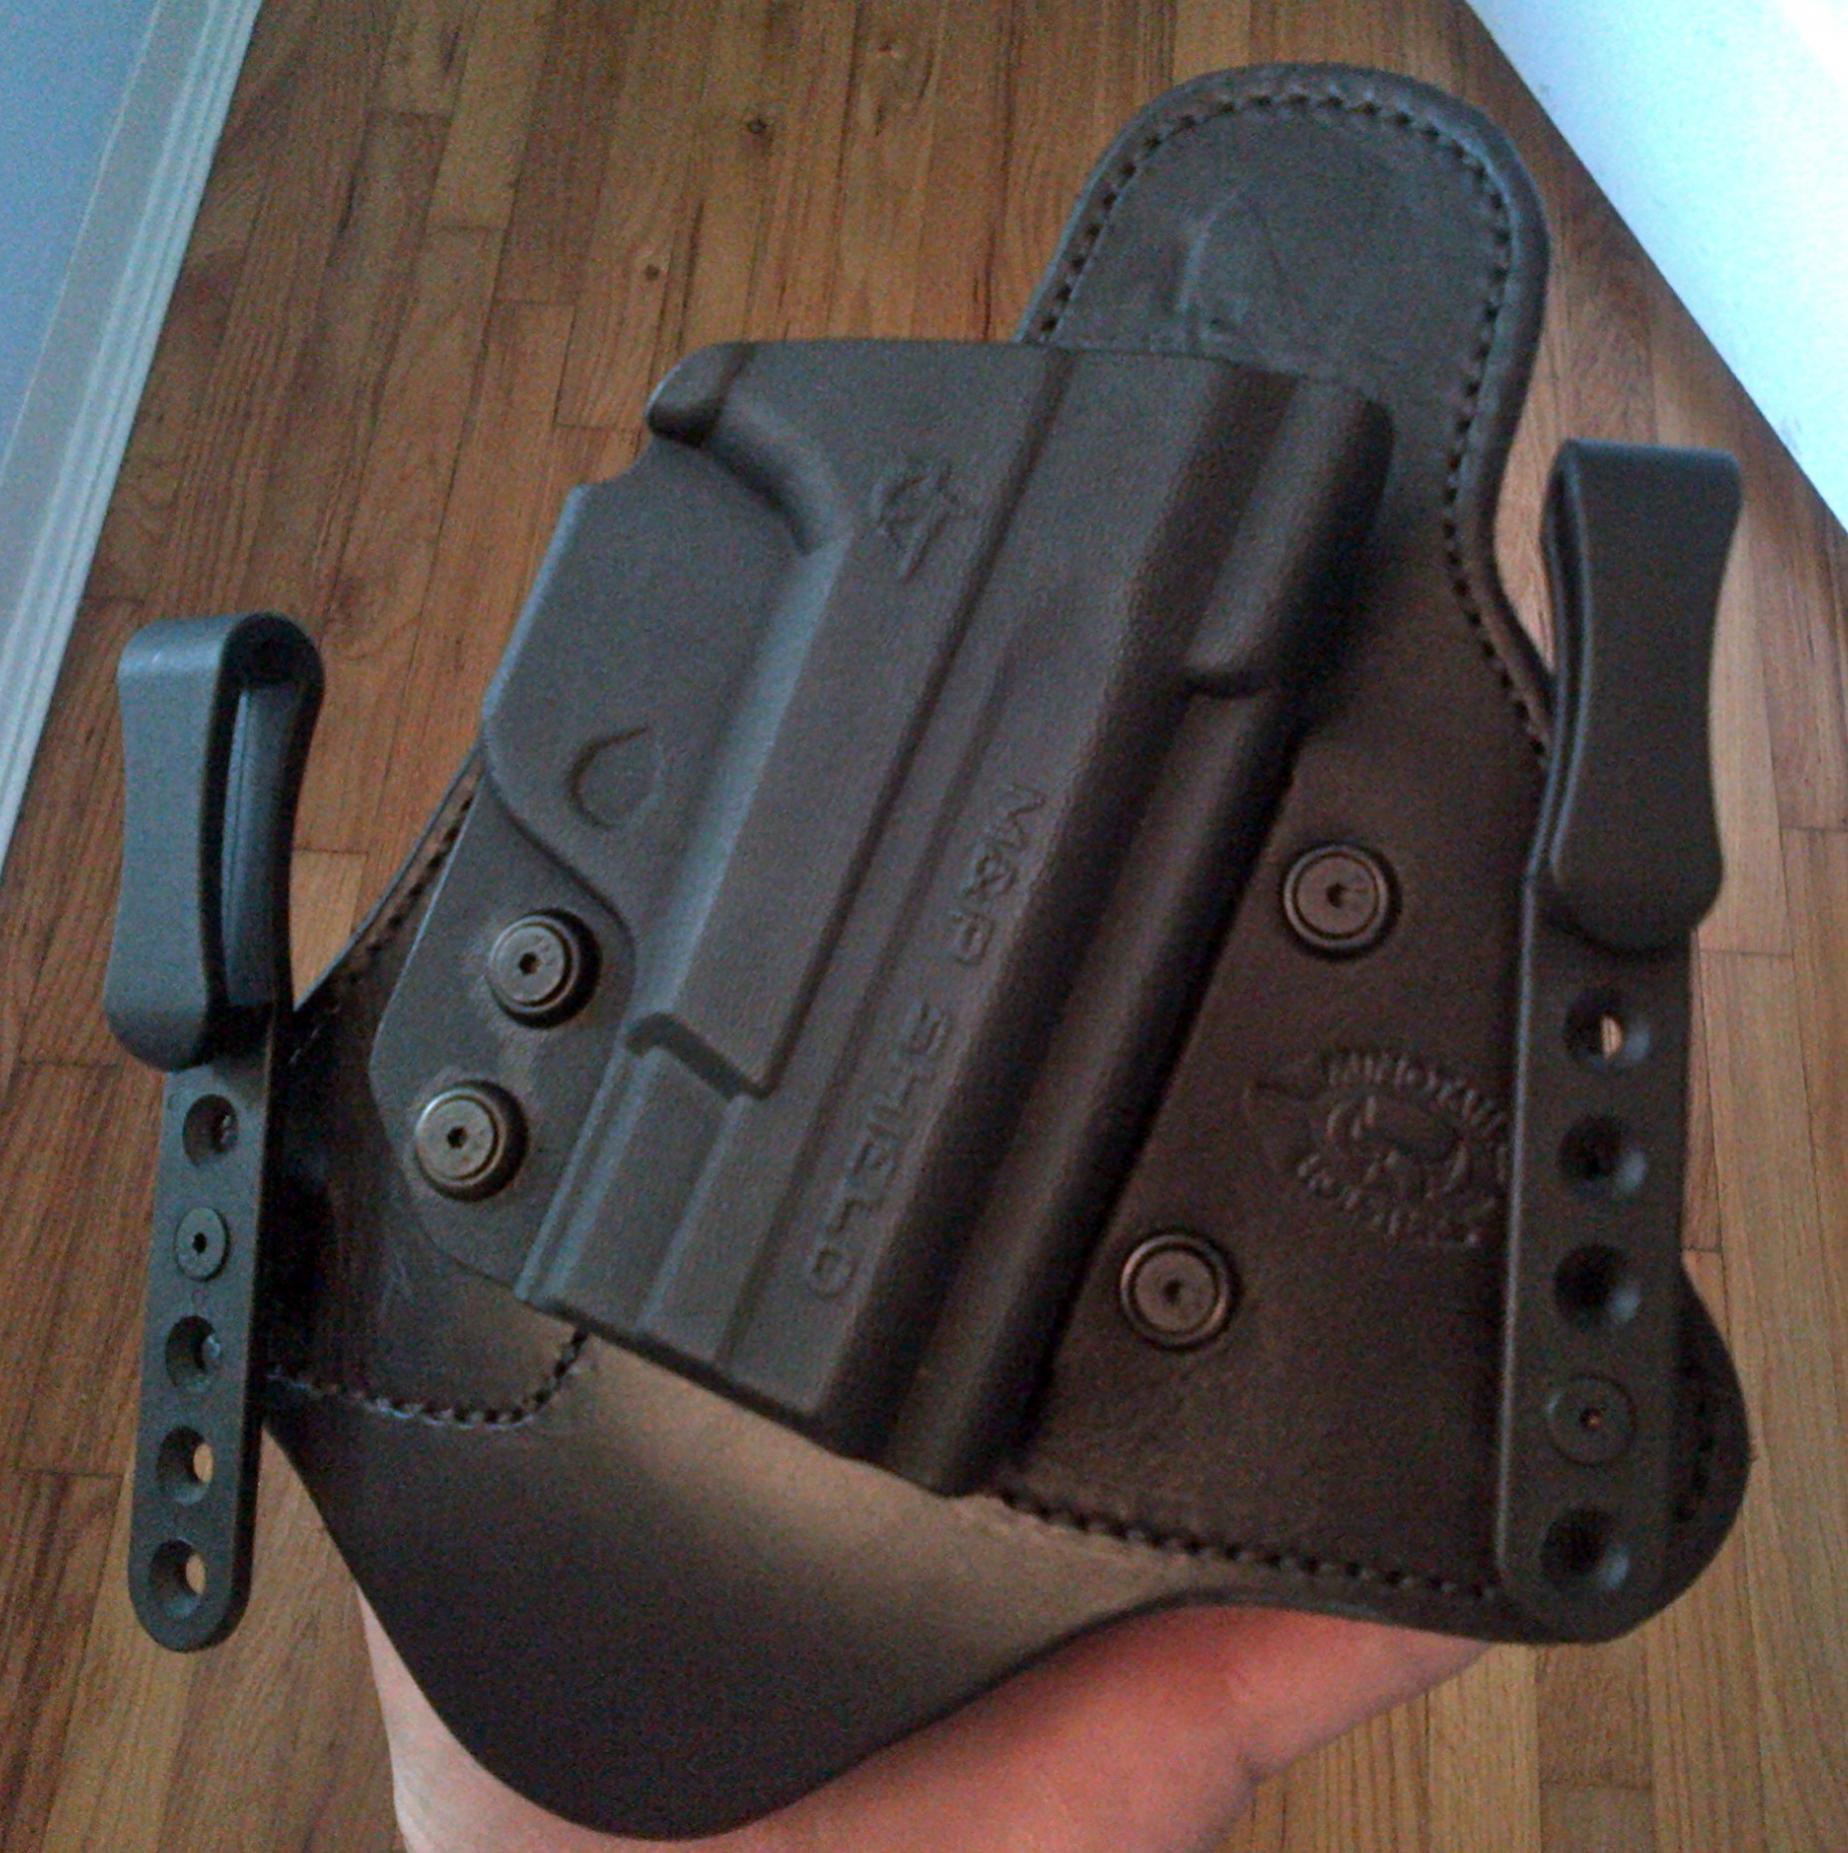 WTS: Like New Comp-Tac Minotaur MTAC for M&P Shield (TX)-img-20120730-00387.jpg